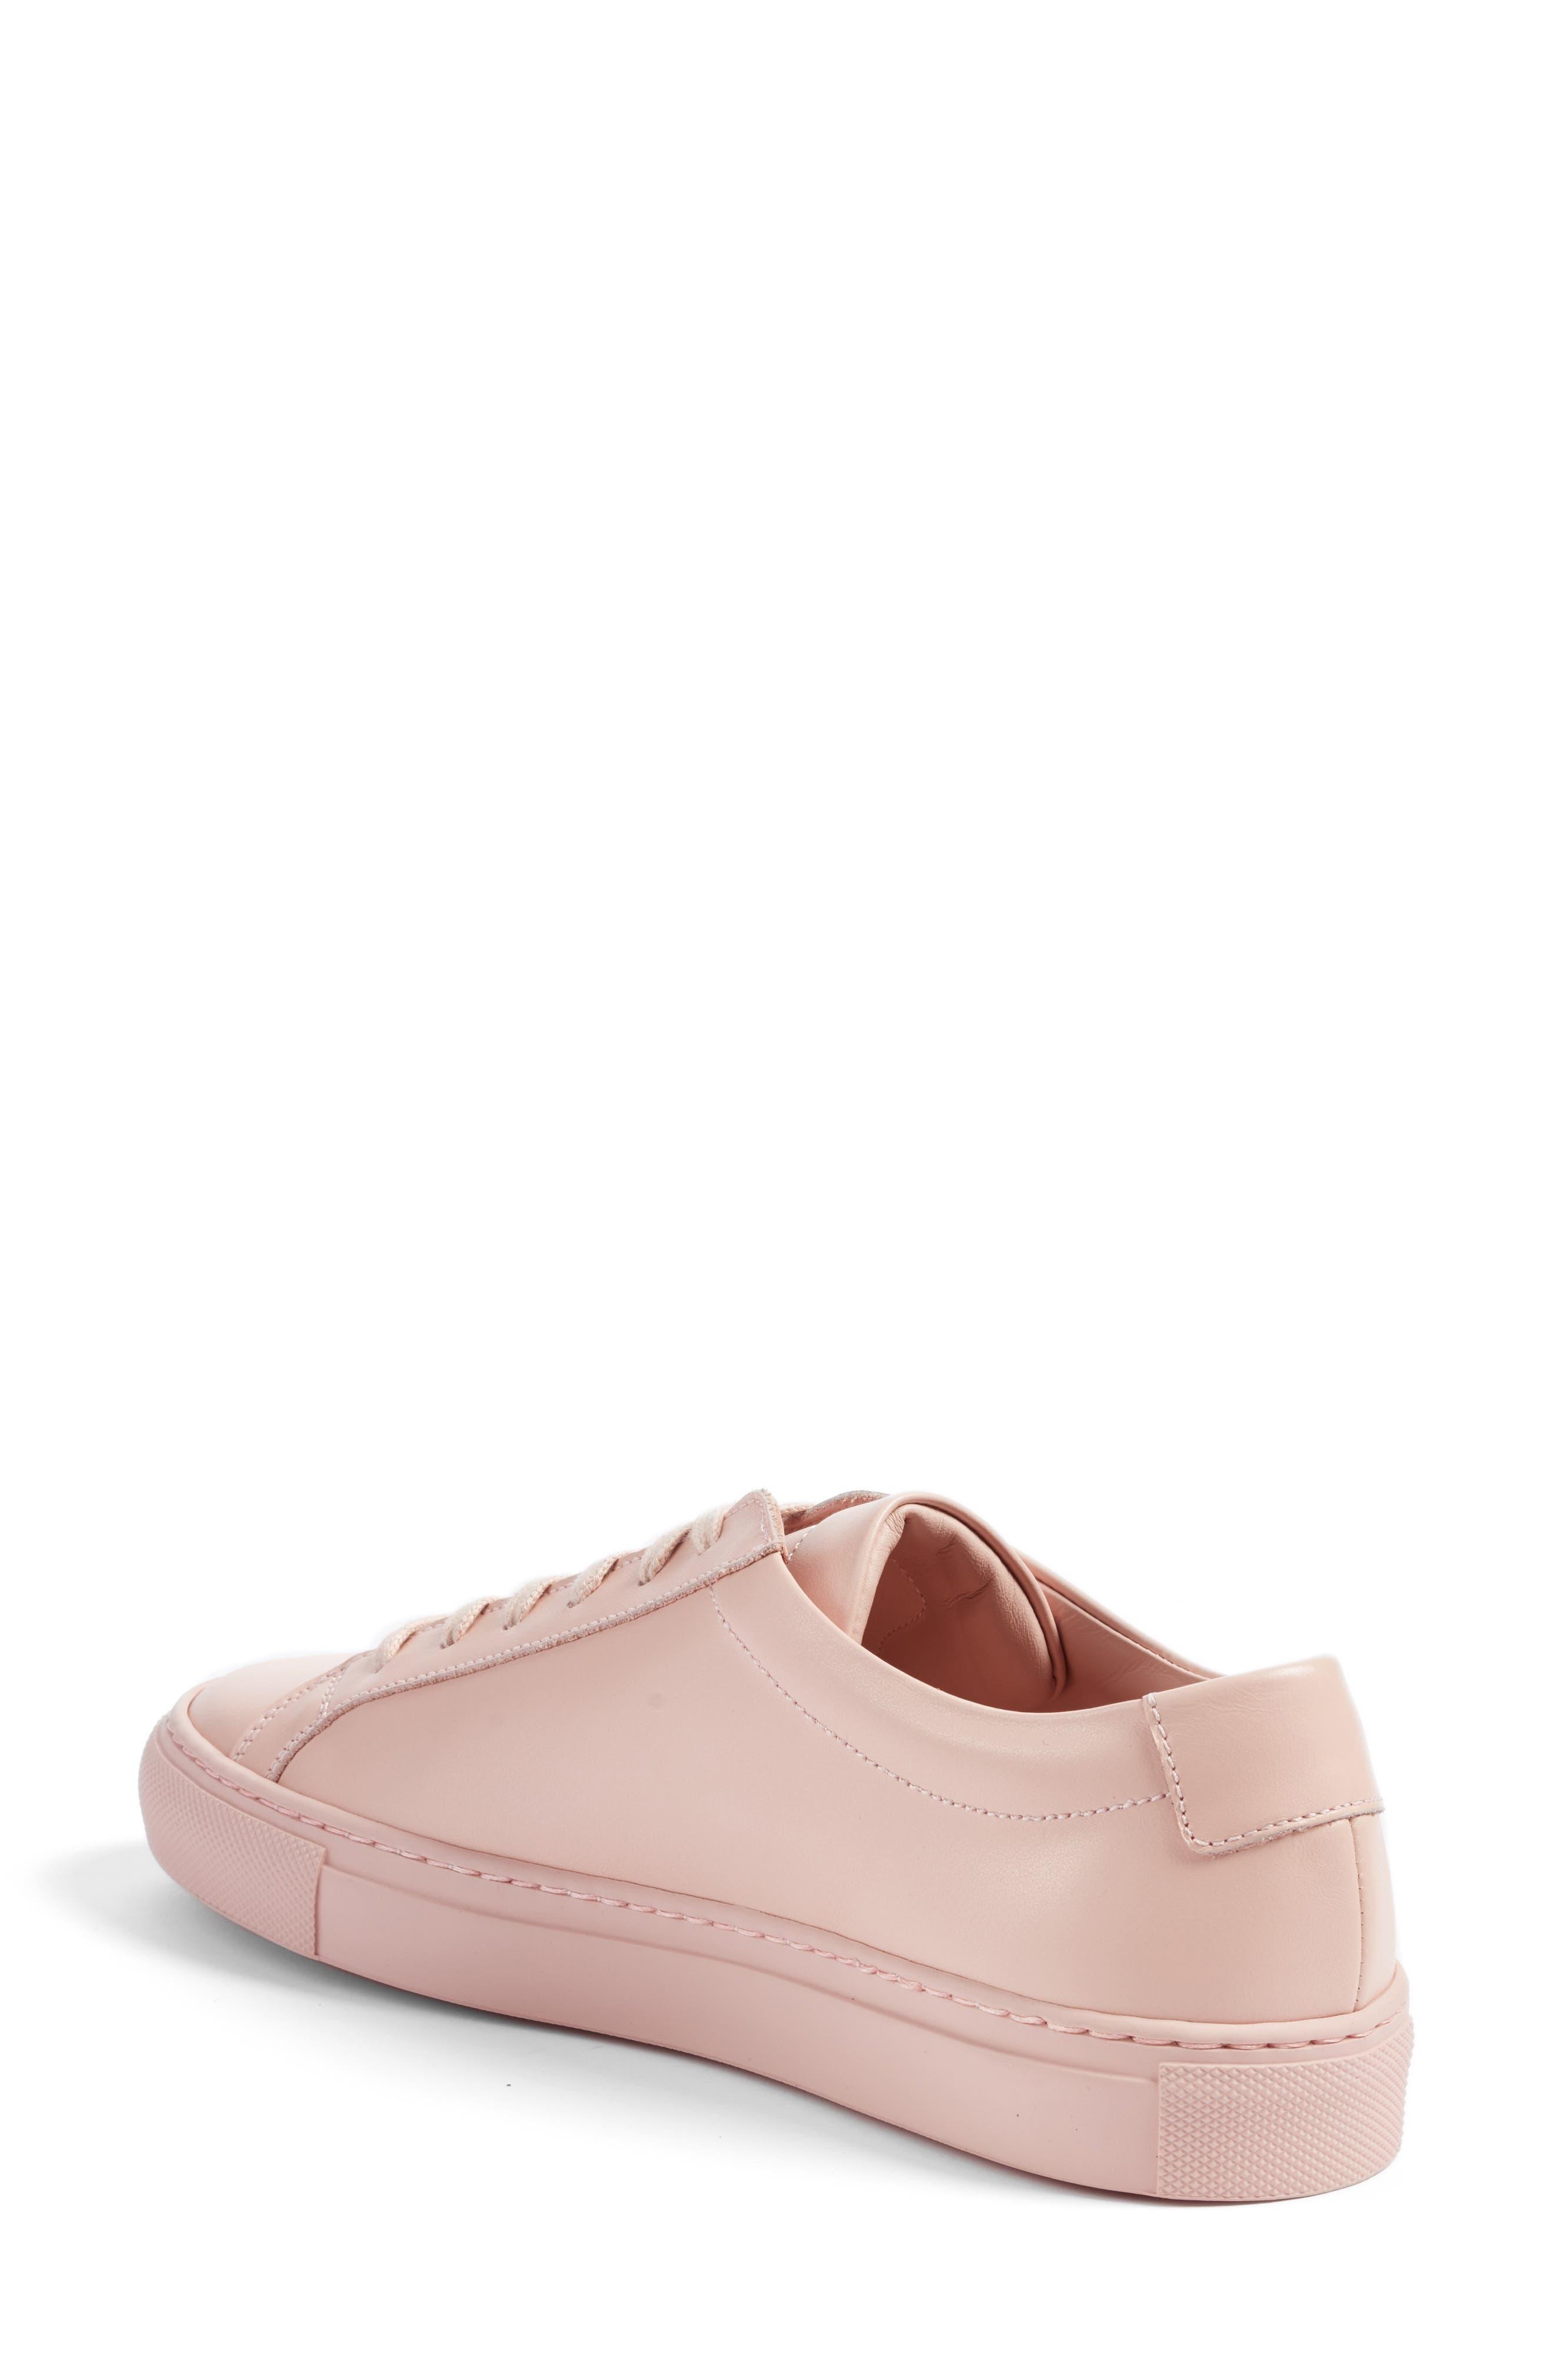 Original Achilles Sneaker,                             Alternate thumbnail 2, color,                             Blush Leather